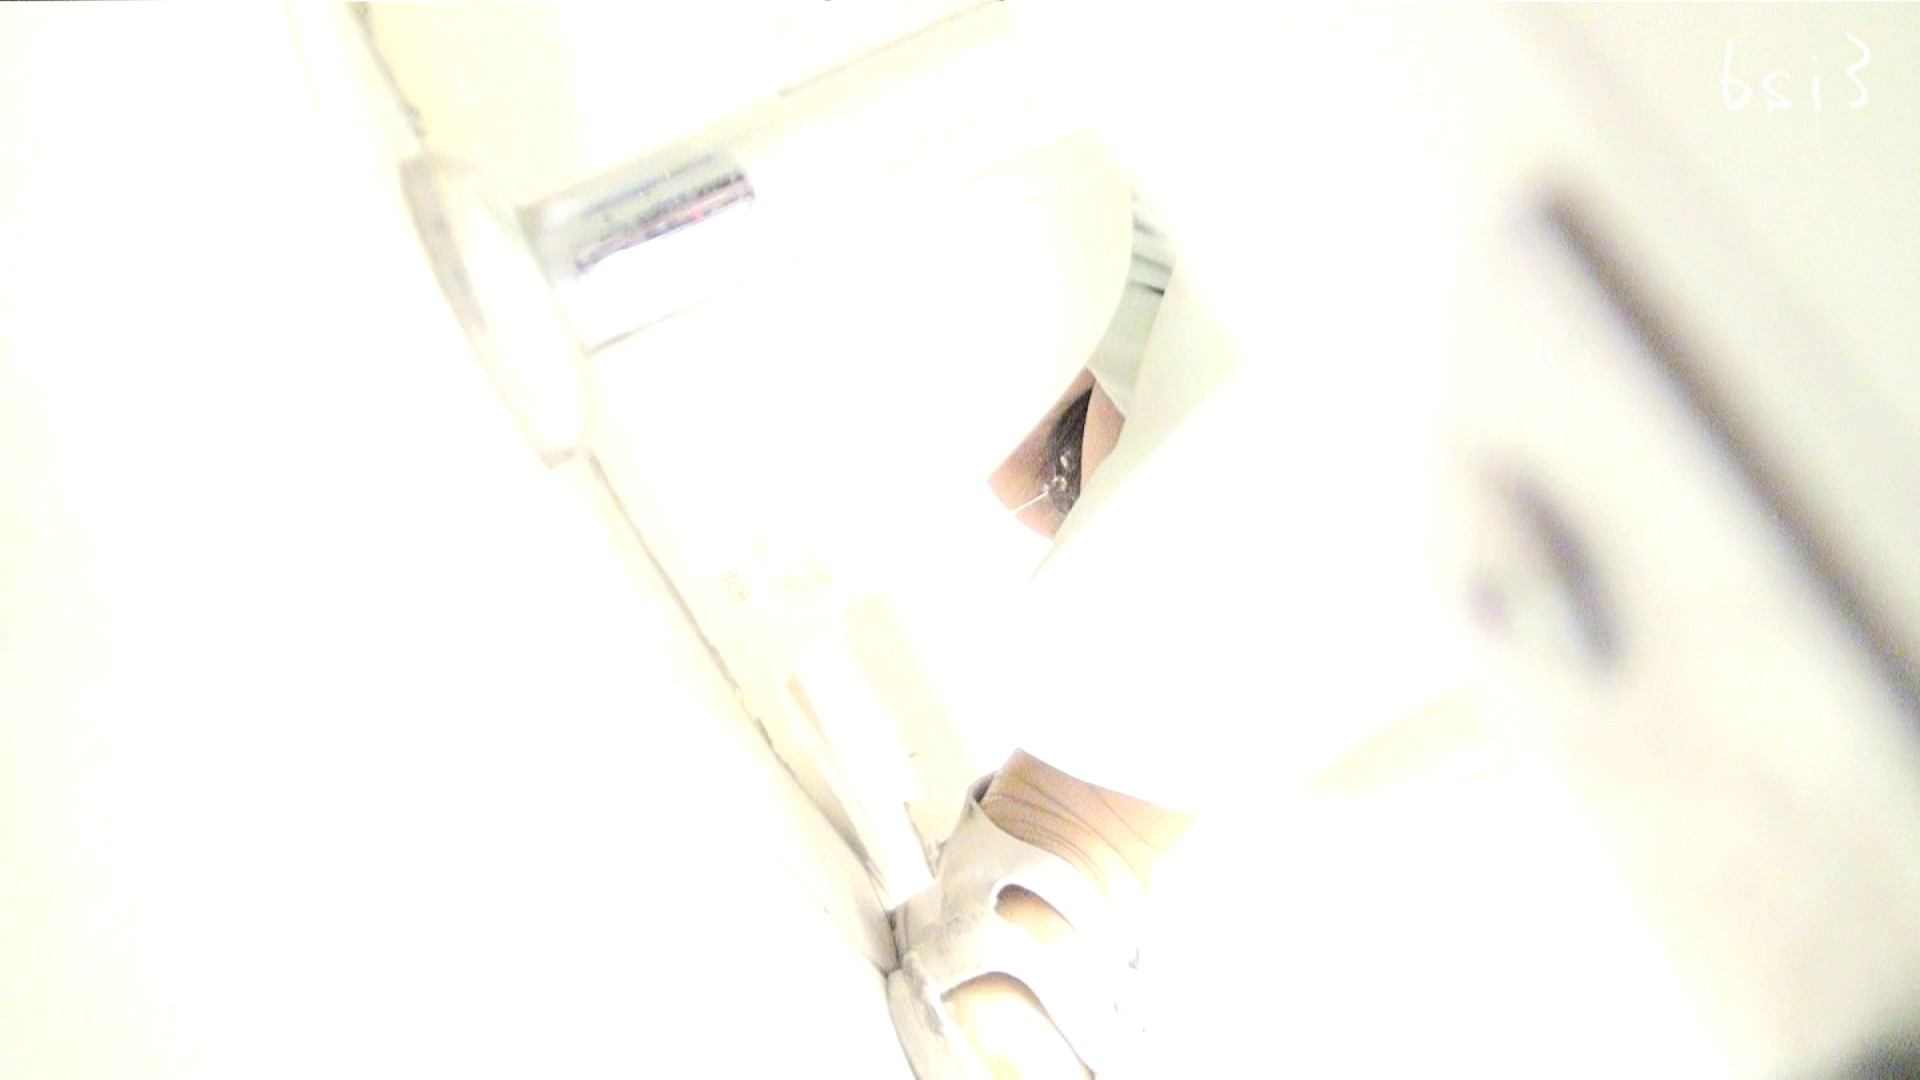 至高下半身盗撮-PREMIUM-【院内病棟編 】 vol.03 洗面所 AV無料動画キャプチャ 98連発 19